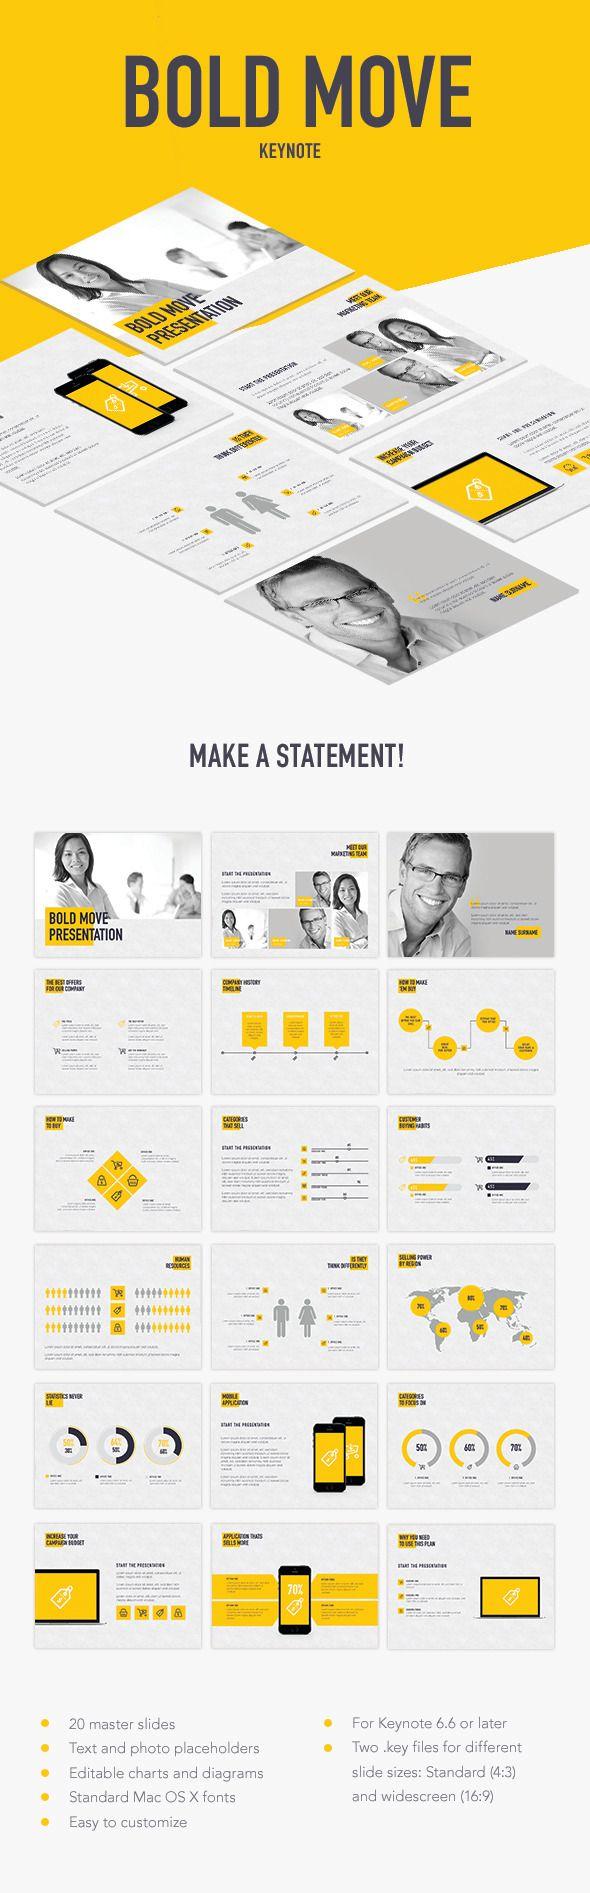 Bold Move Keynote Template #design #slides Download: http://graphicriver.net/item/bold-move-keynote-template/13745410?ref=ksioks